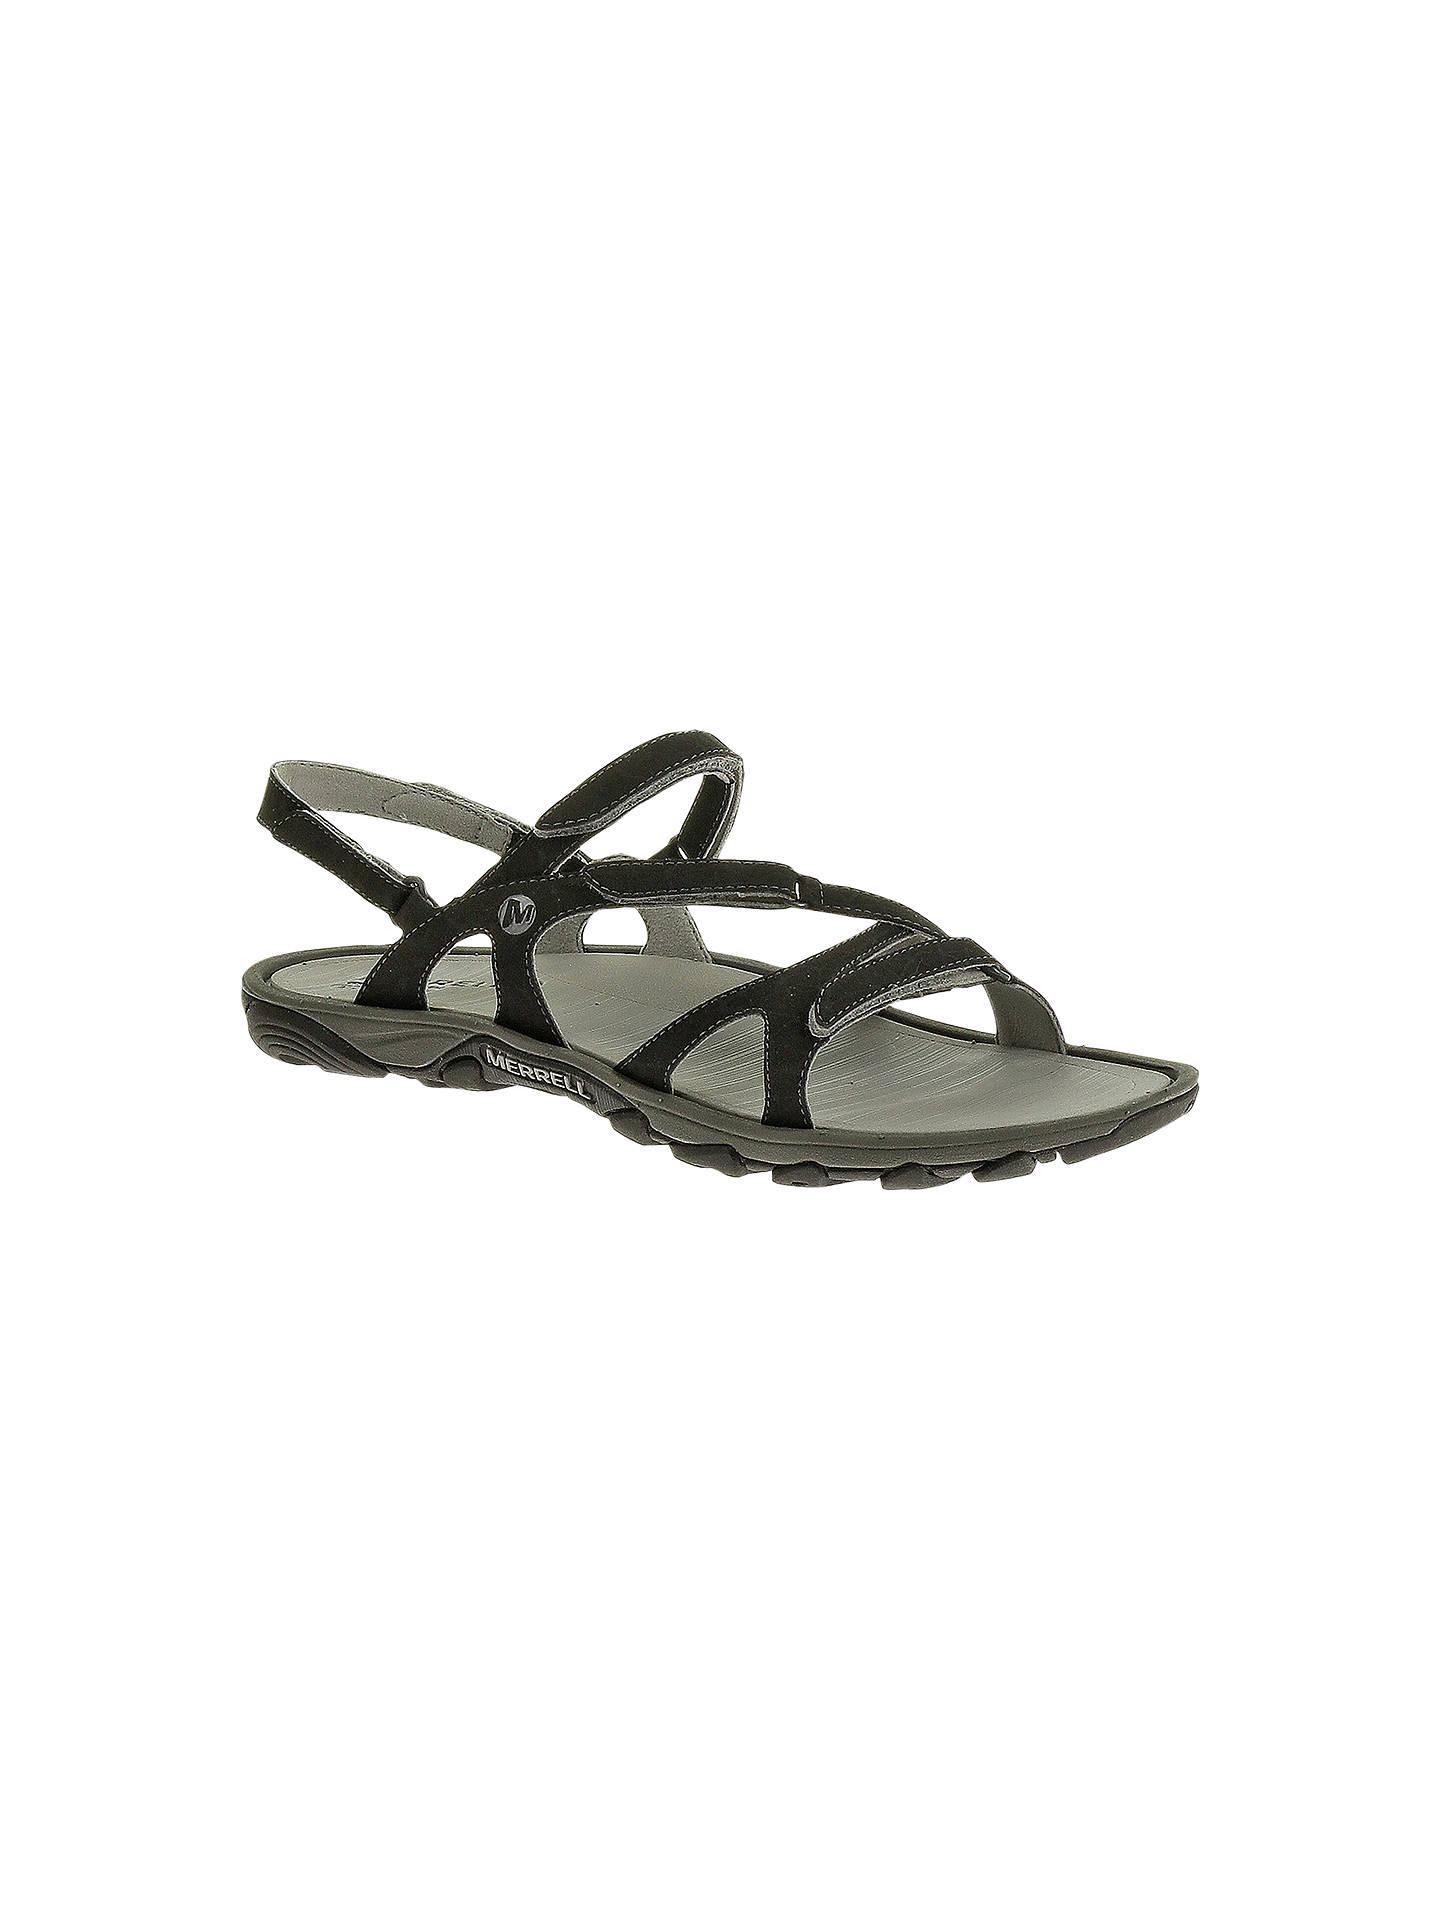 11a9474421e Merrell Enoki Convertible Sandals at John Lewis   Partners